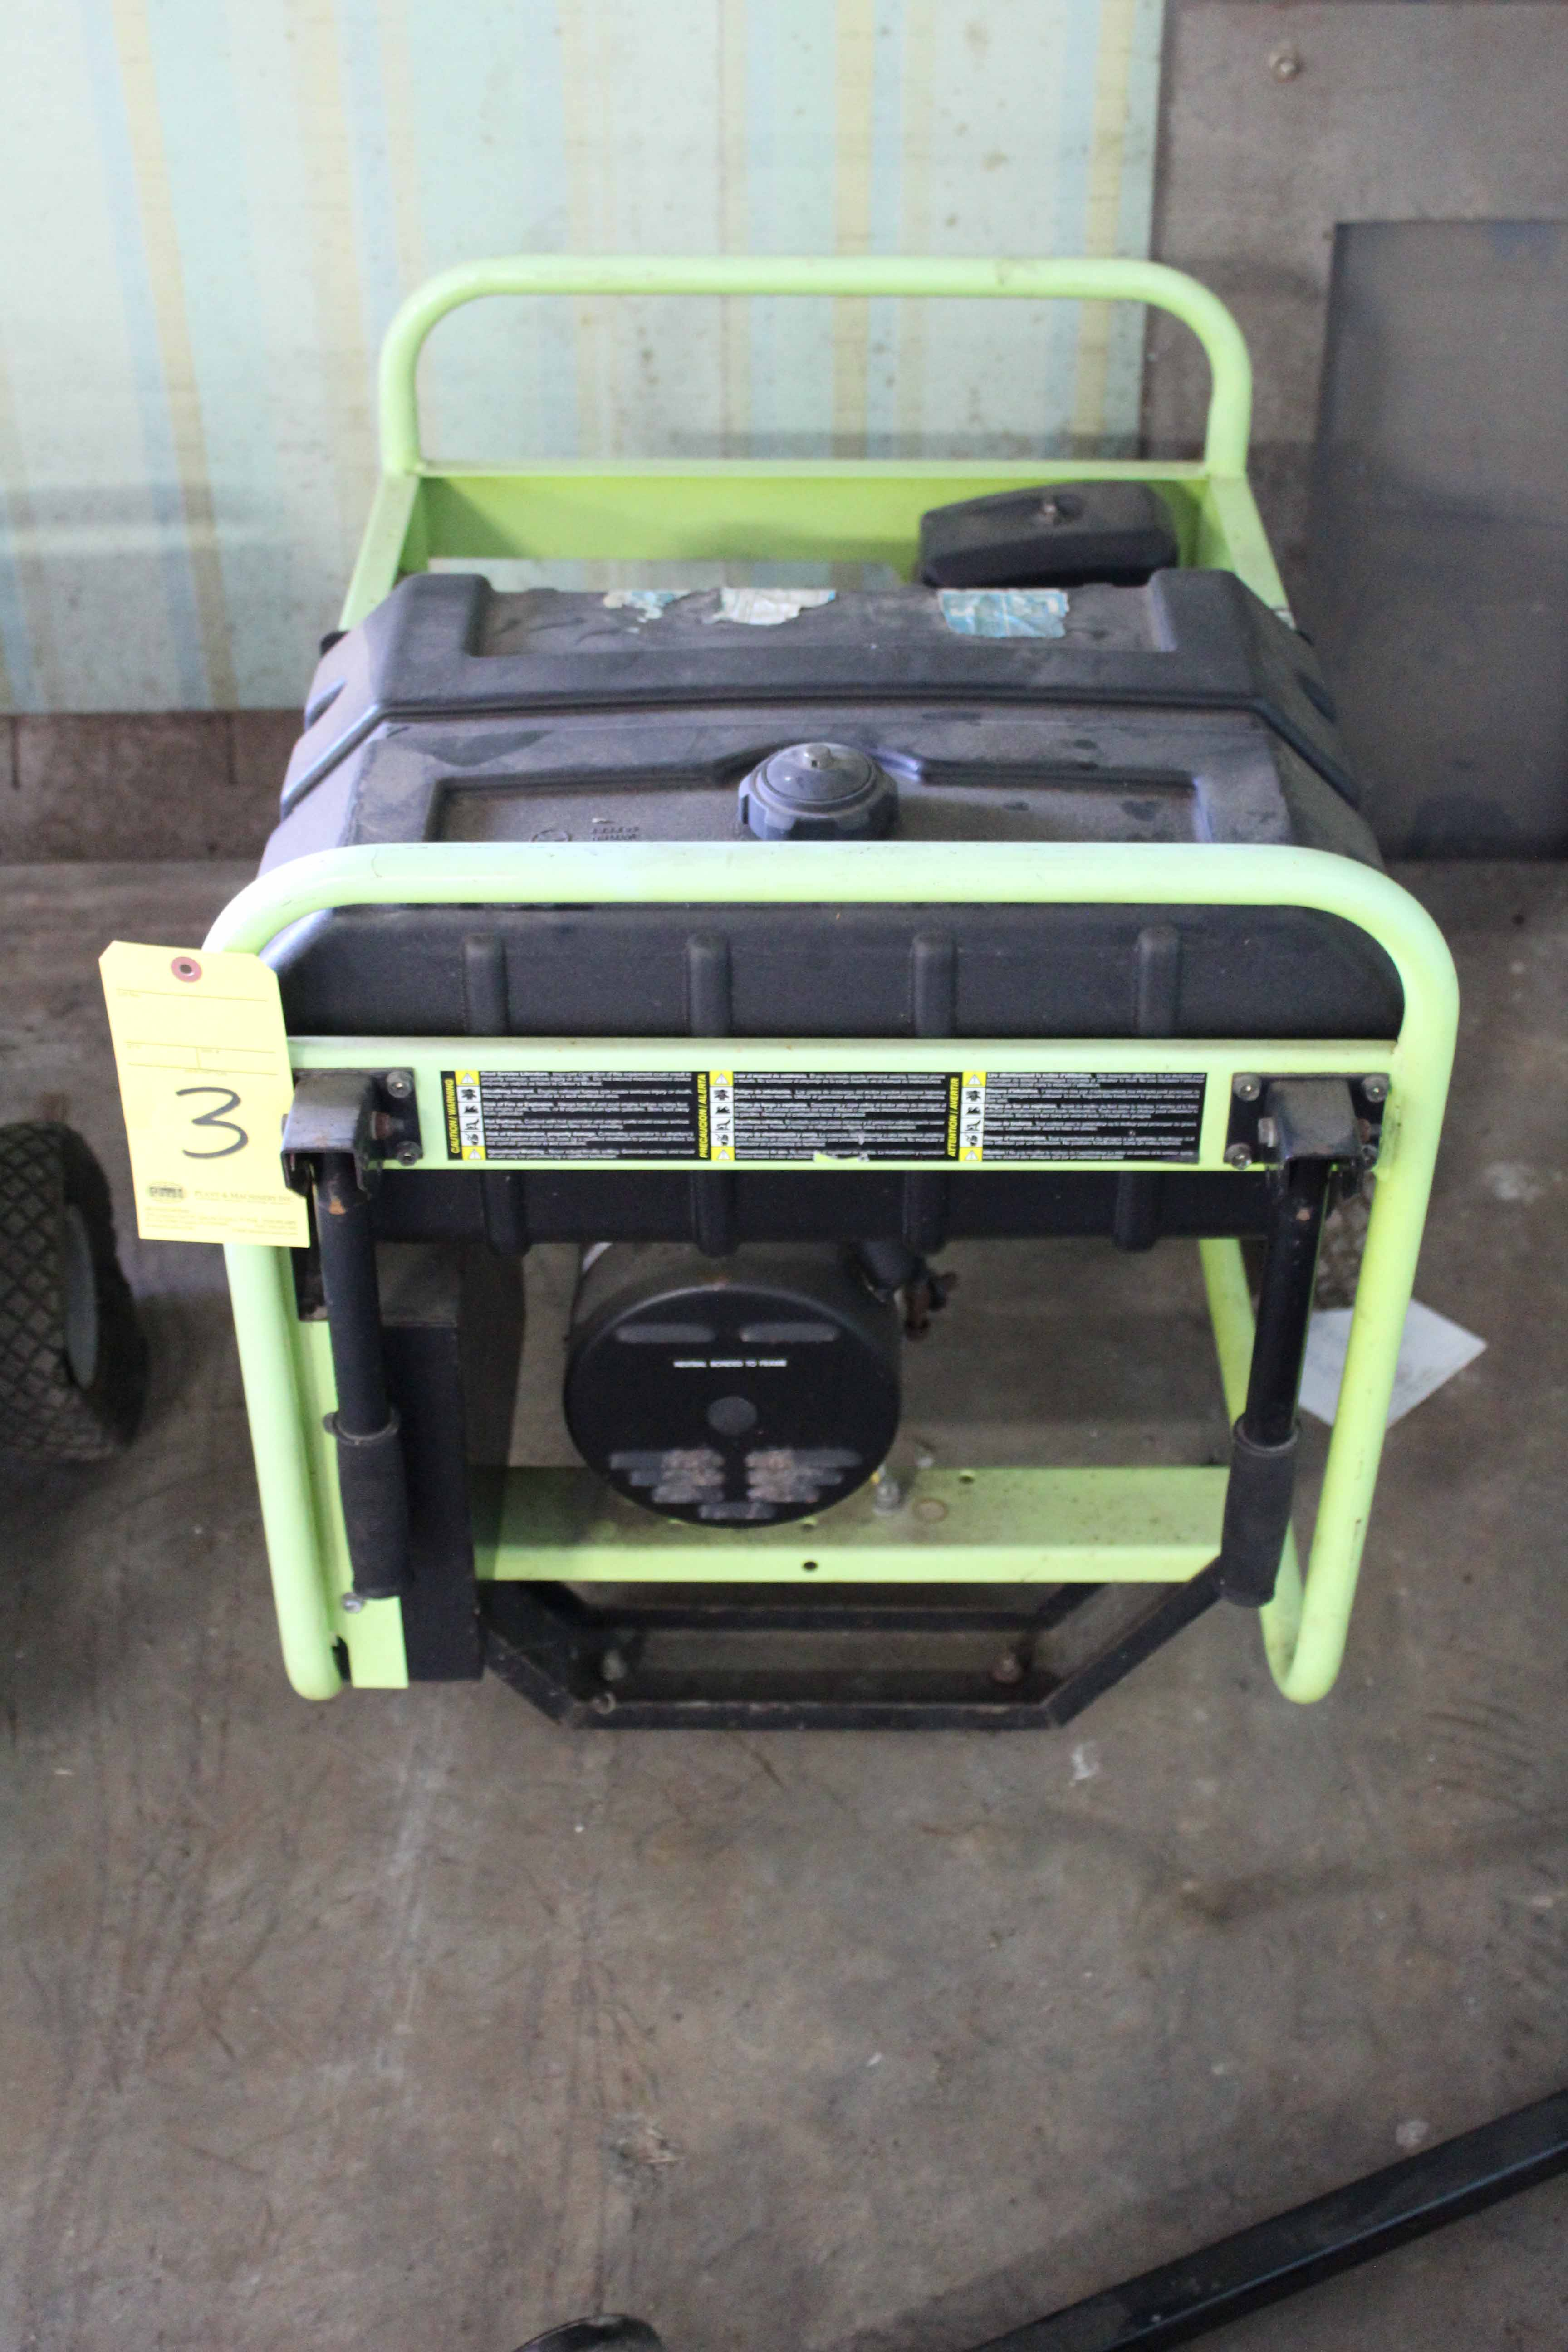 Lot 3 - PORTABLE GENERATOR, PRAMAC, 5,000 watt, gasoline pwrd.